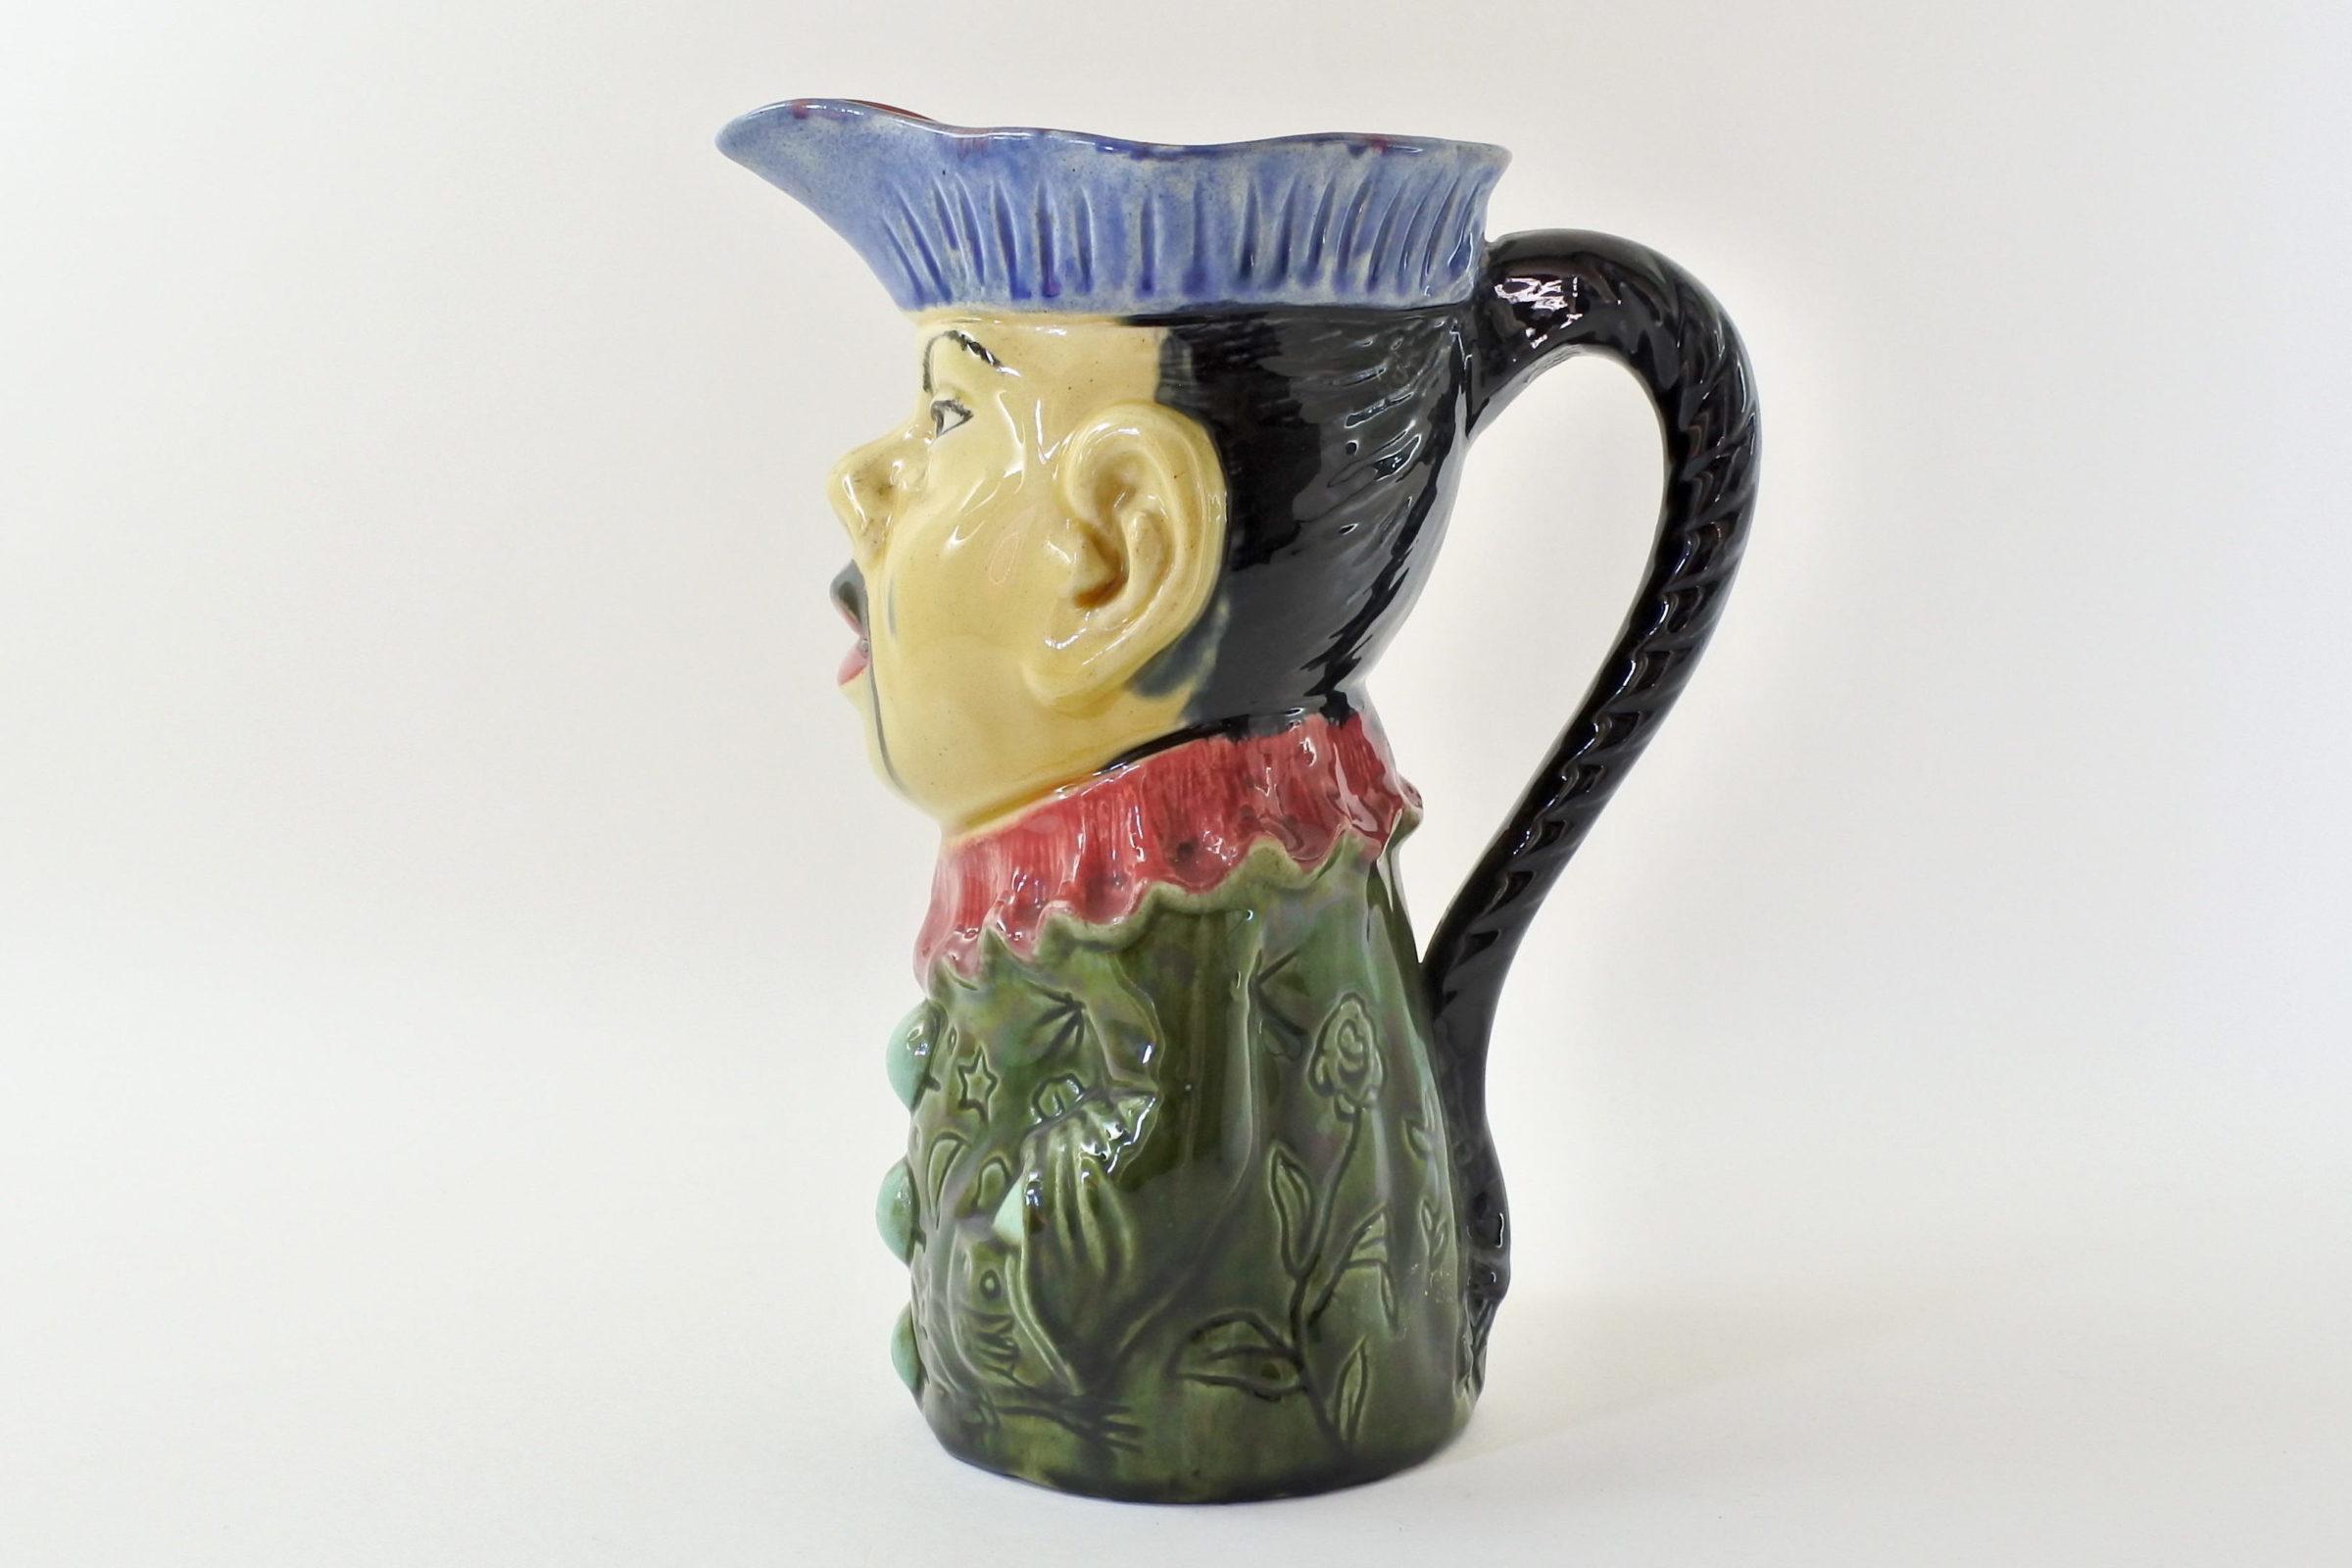 Brocca in ceramica barbotine a forma di cinese - Orchies - 2